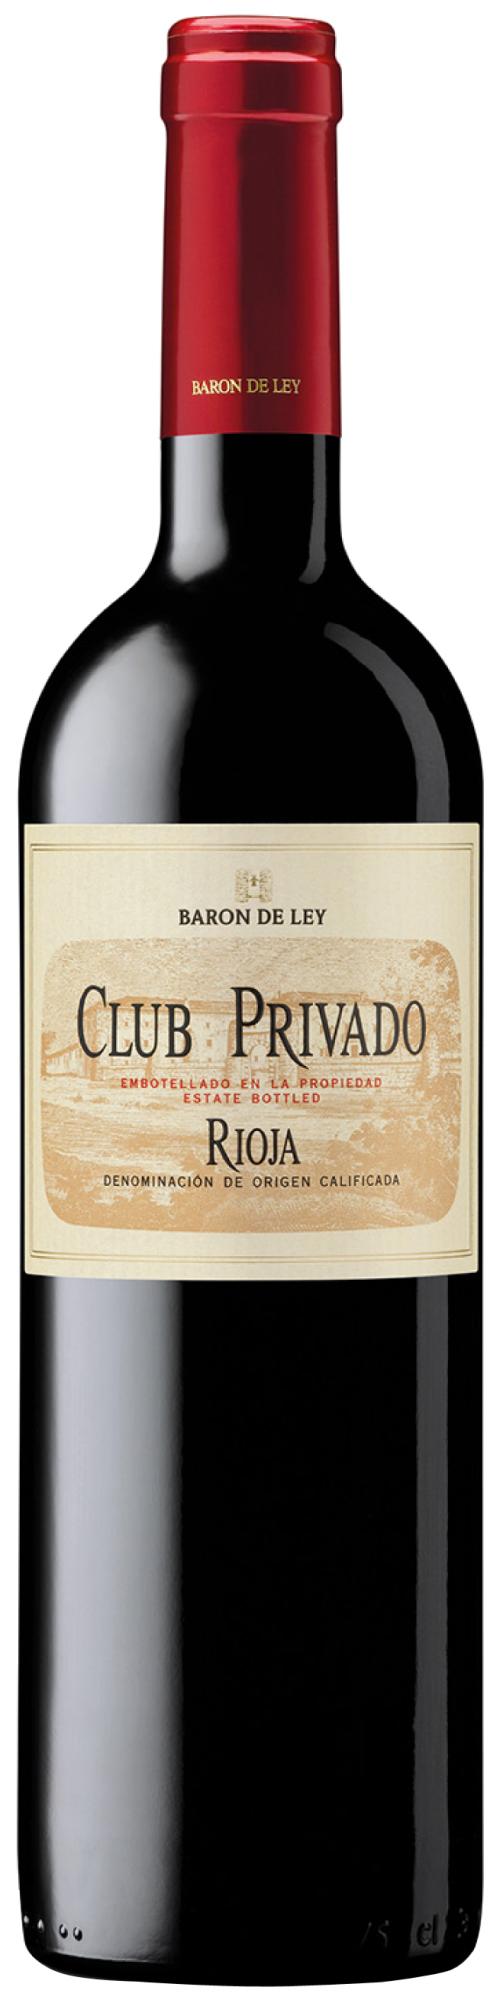 11-rood-club-privado-afbeelding